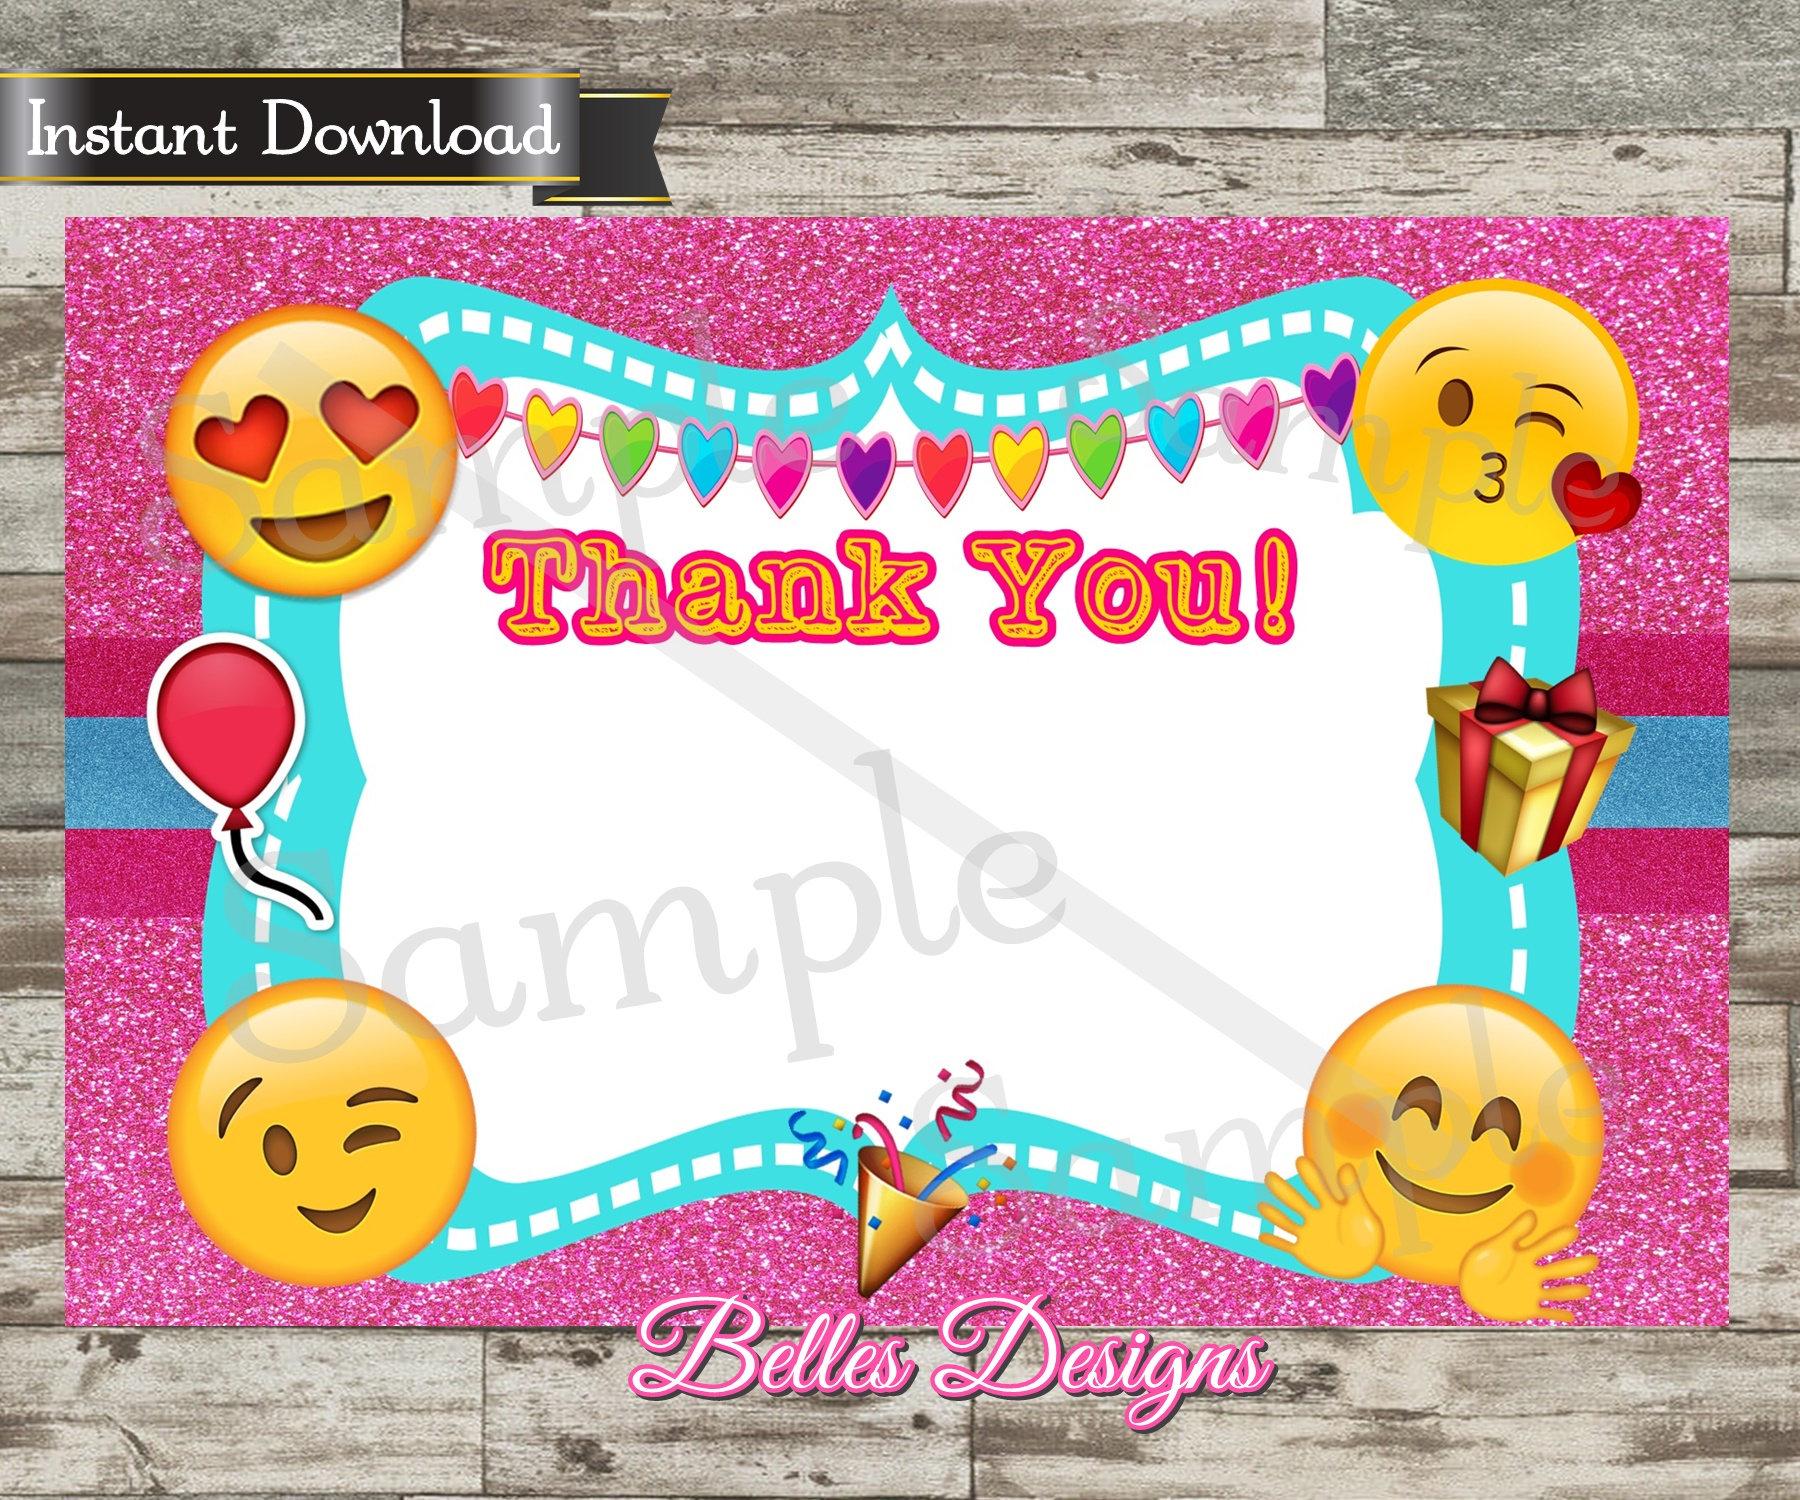 Tarjeta de gracias Emoji Emoji cumpleaños gracias tarjeta en | Etsy